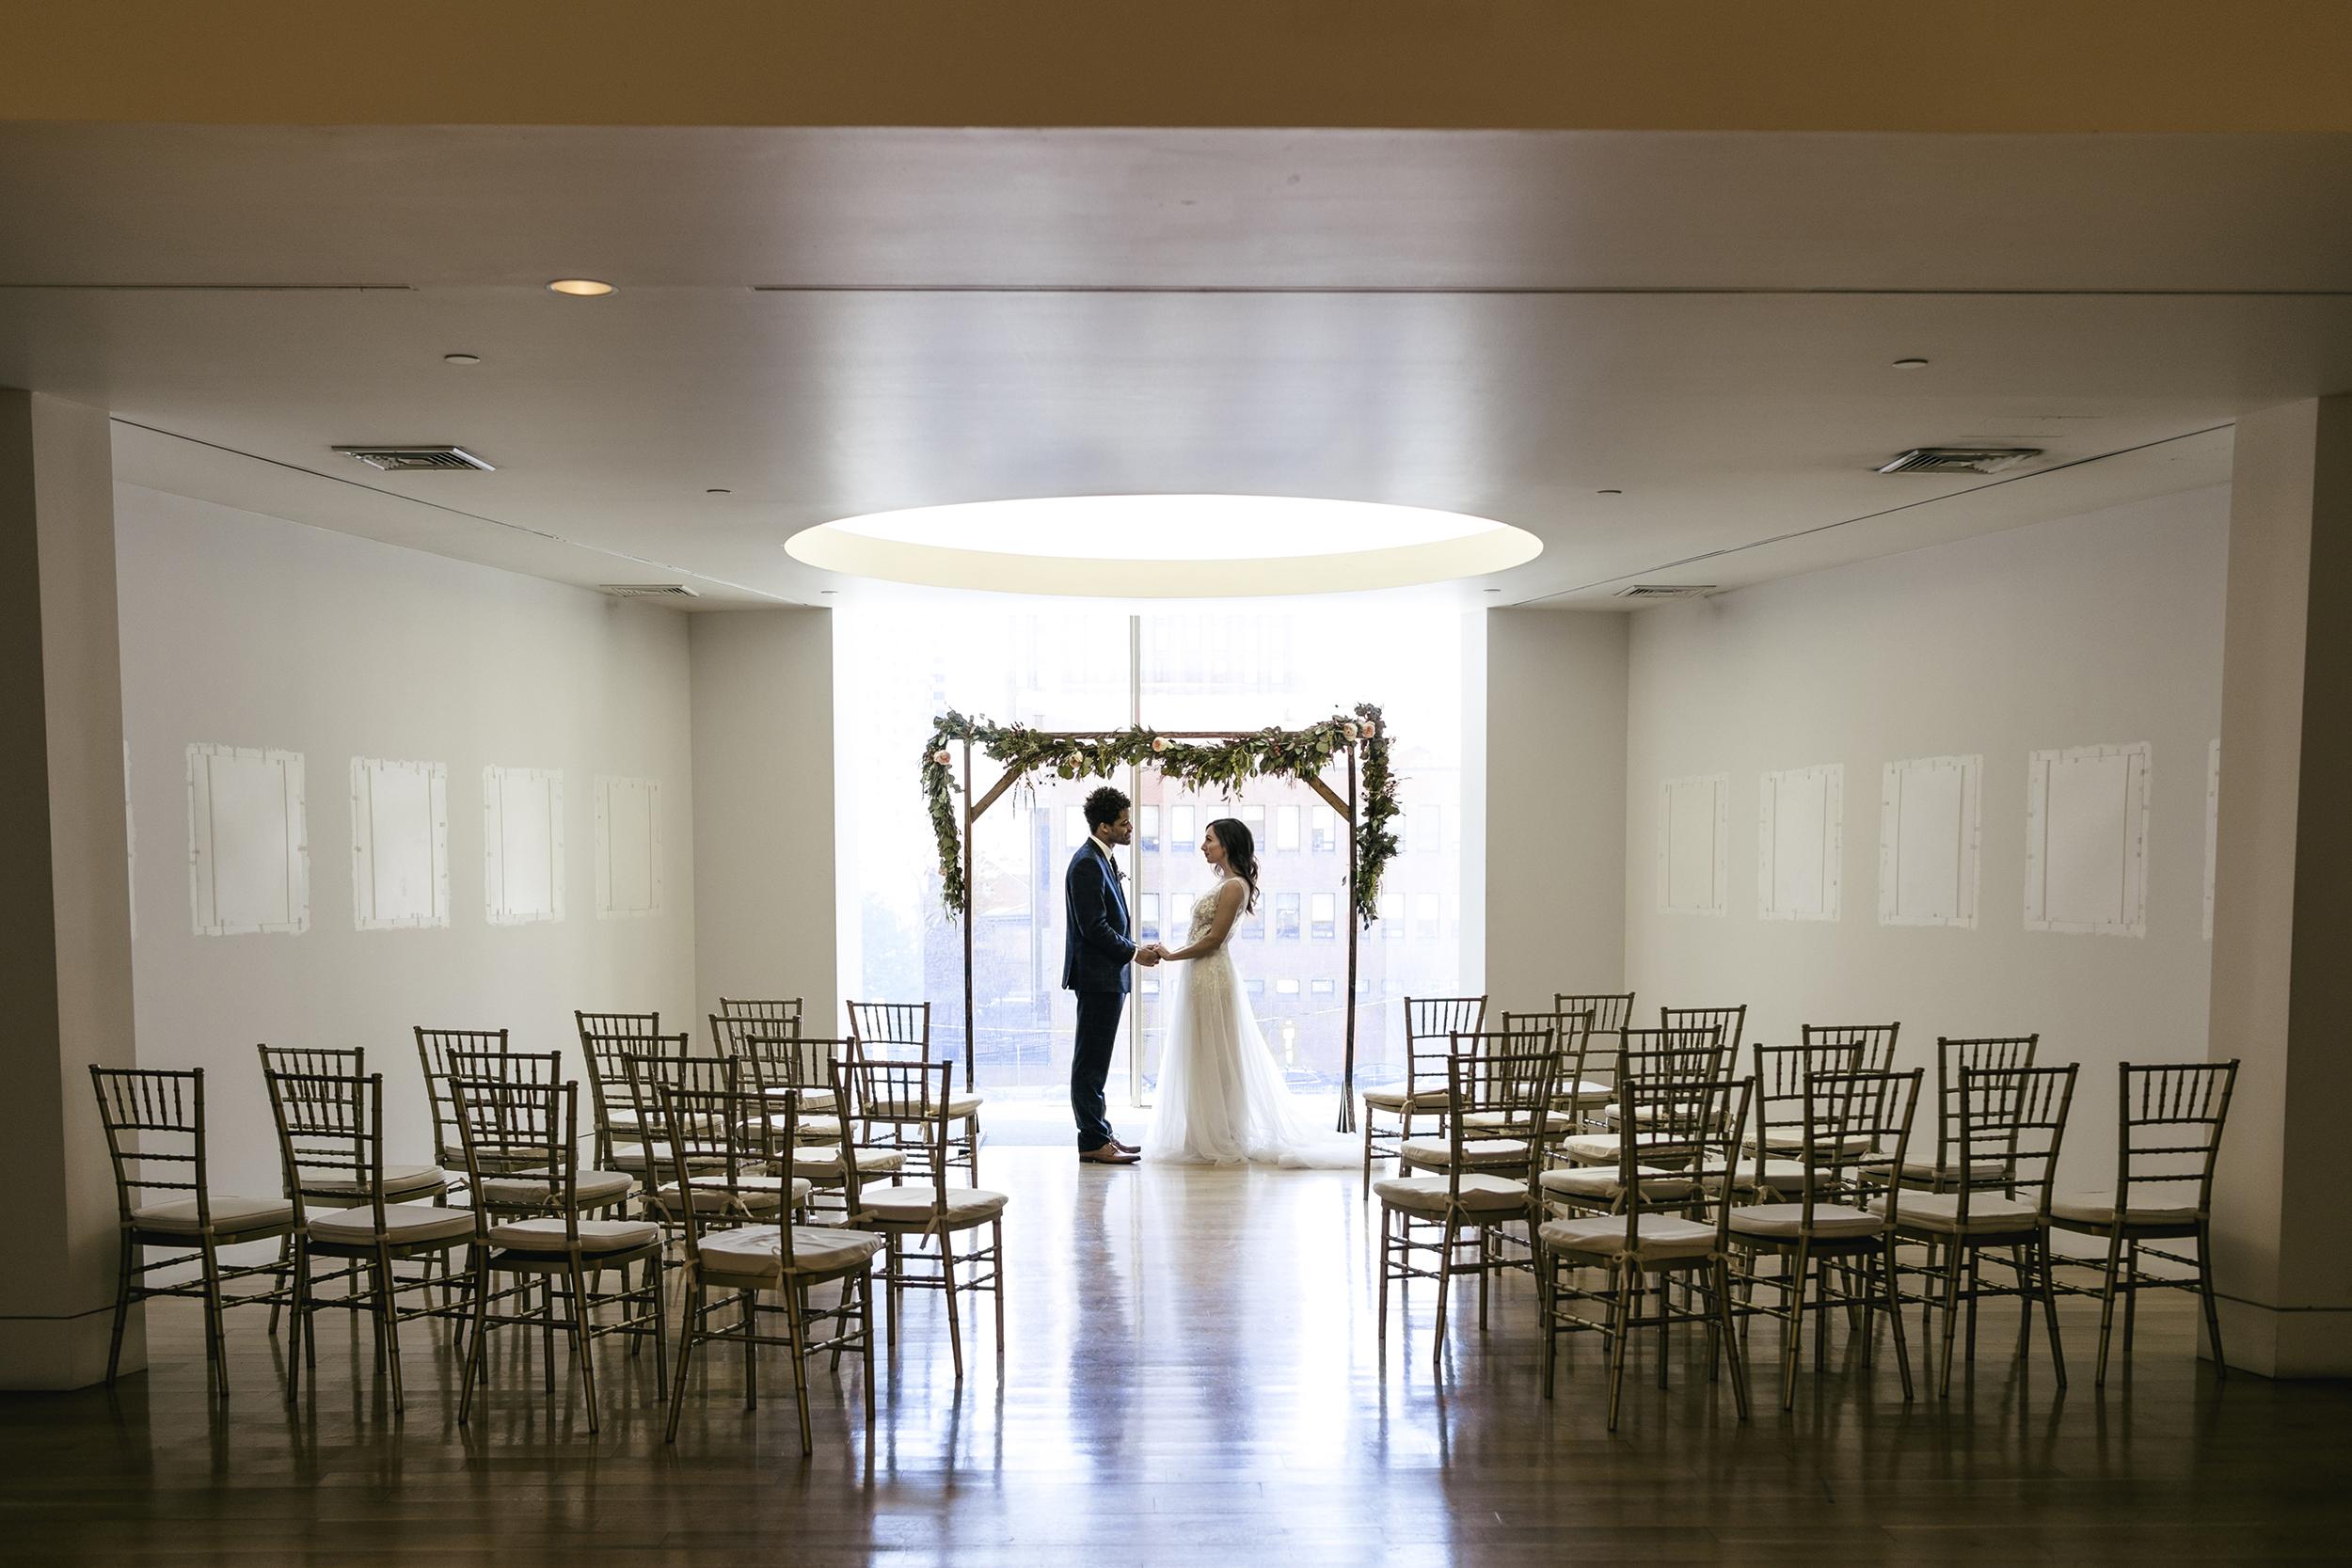 photography-wedding-weddings-natural-candid-pafa-pennsylvania academy-philadephia-philly-philadelphia wedding-mixed race-editorial-modern-fine-art-033.JPG